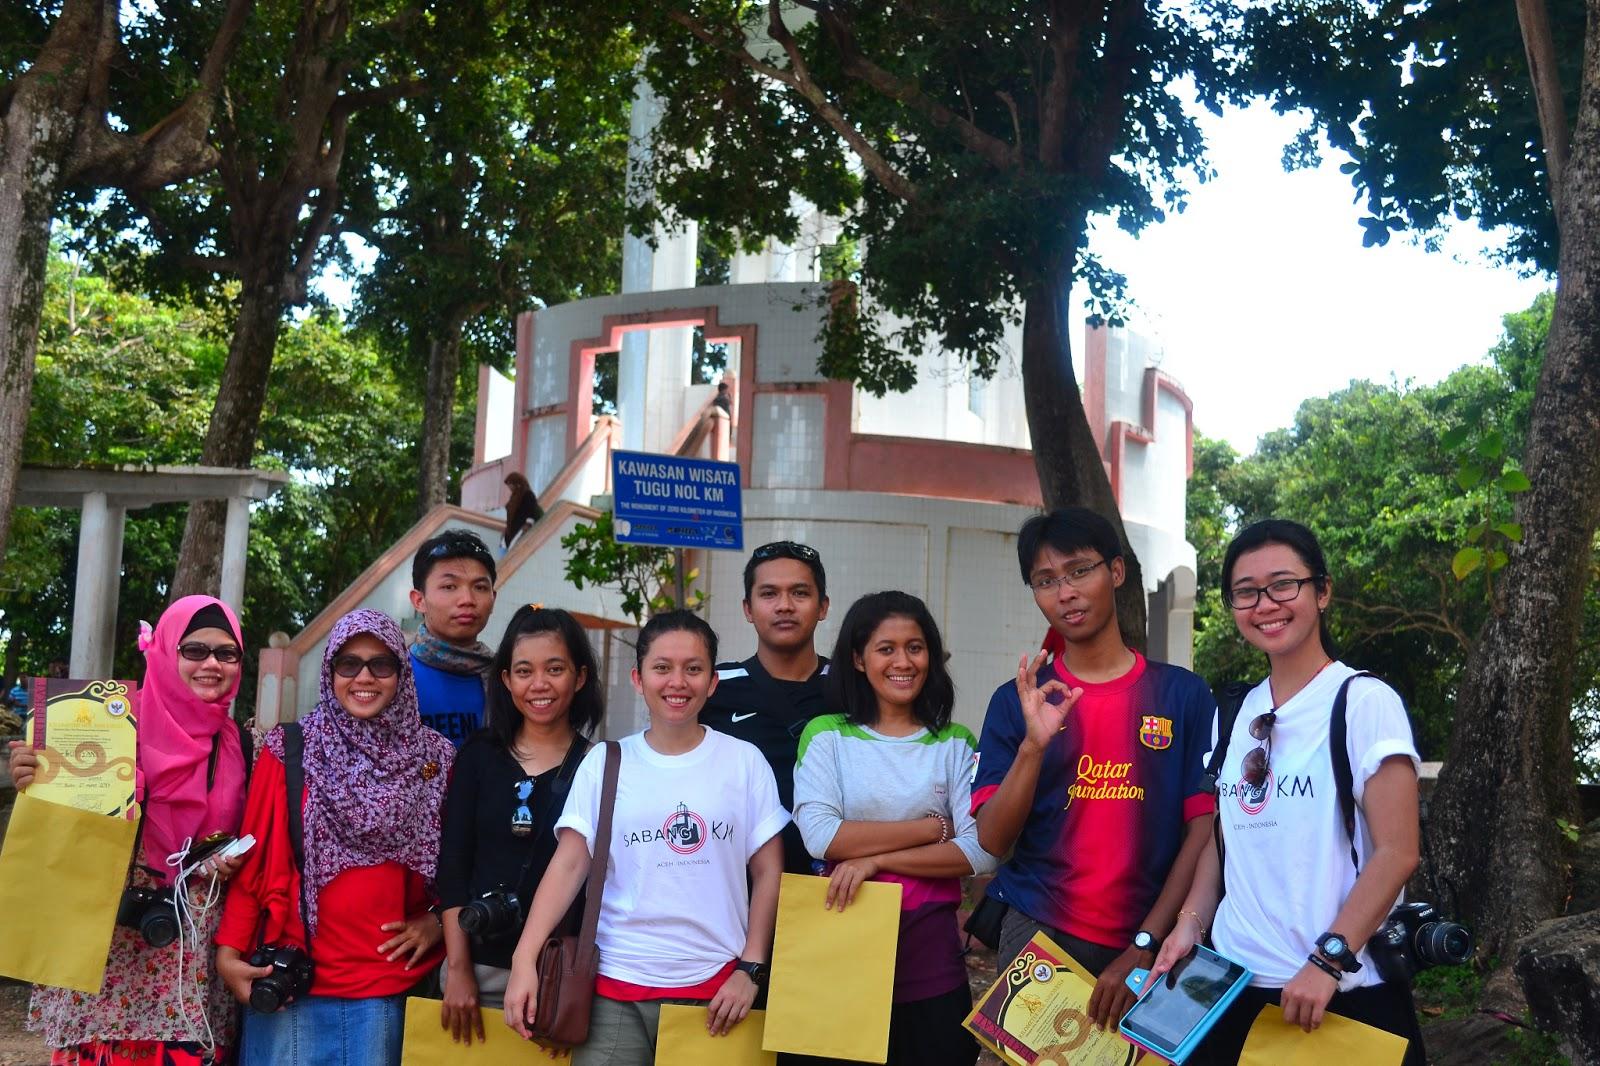 Fahmy Is Here Backpacker Medan Banda Aceh Pulau Weh Sabang Menuju Nol Kilometer Indonesia